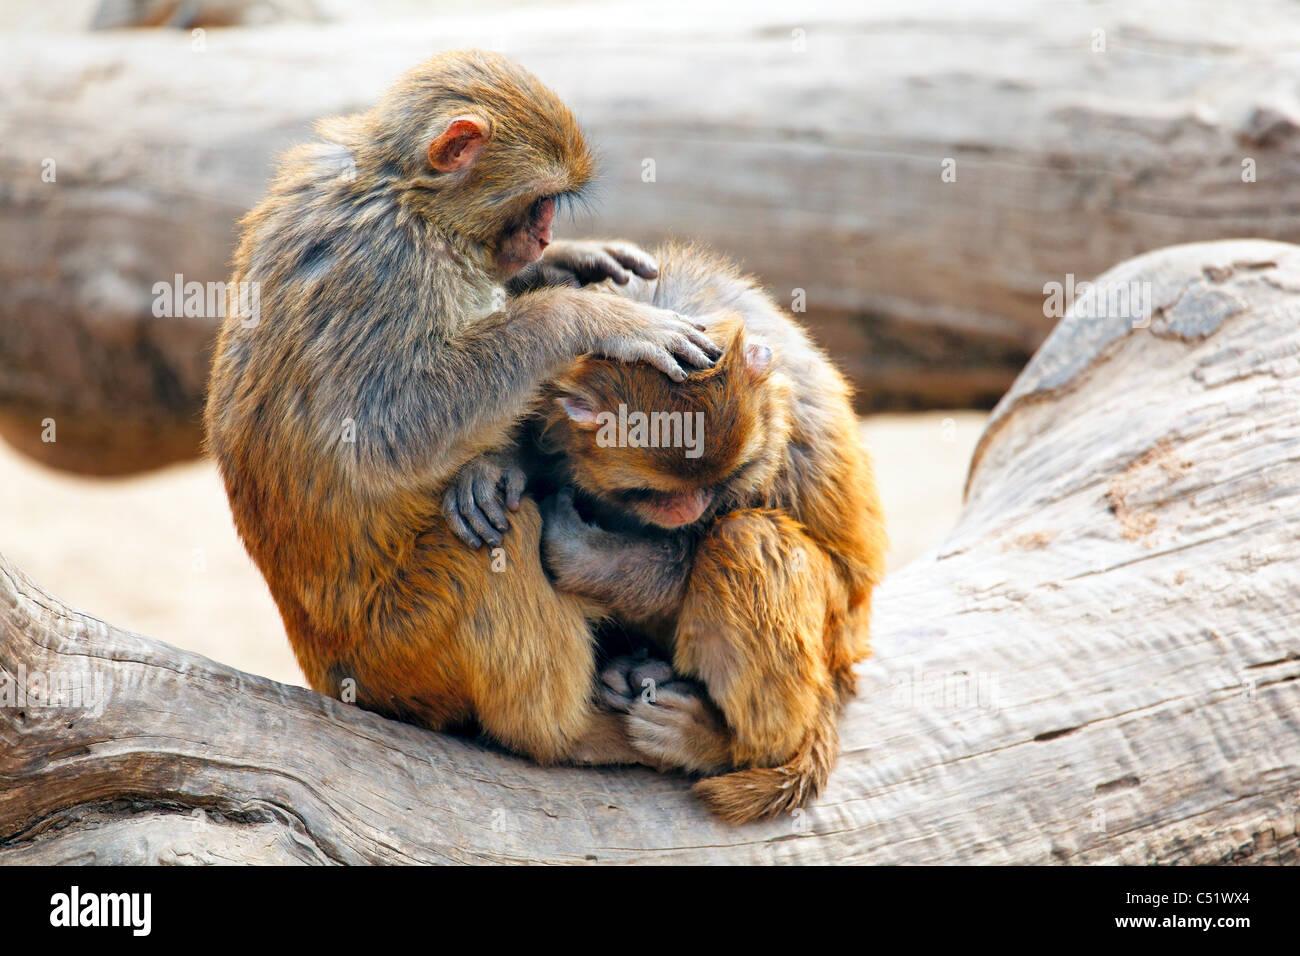 Two Rhesus Monkeys Interacting on a Tree, Quingling Mountain Zoo, Xian, Shaanxi, China - Stock Image